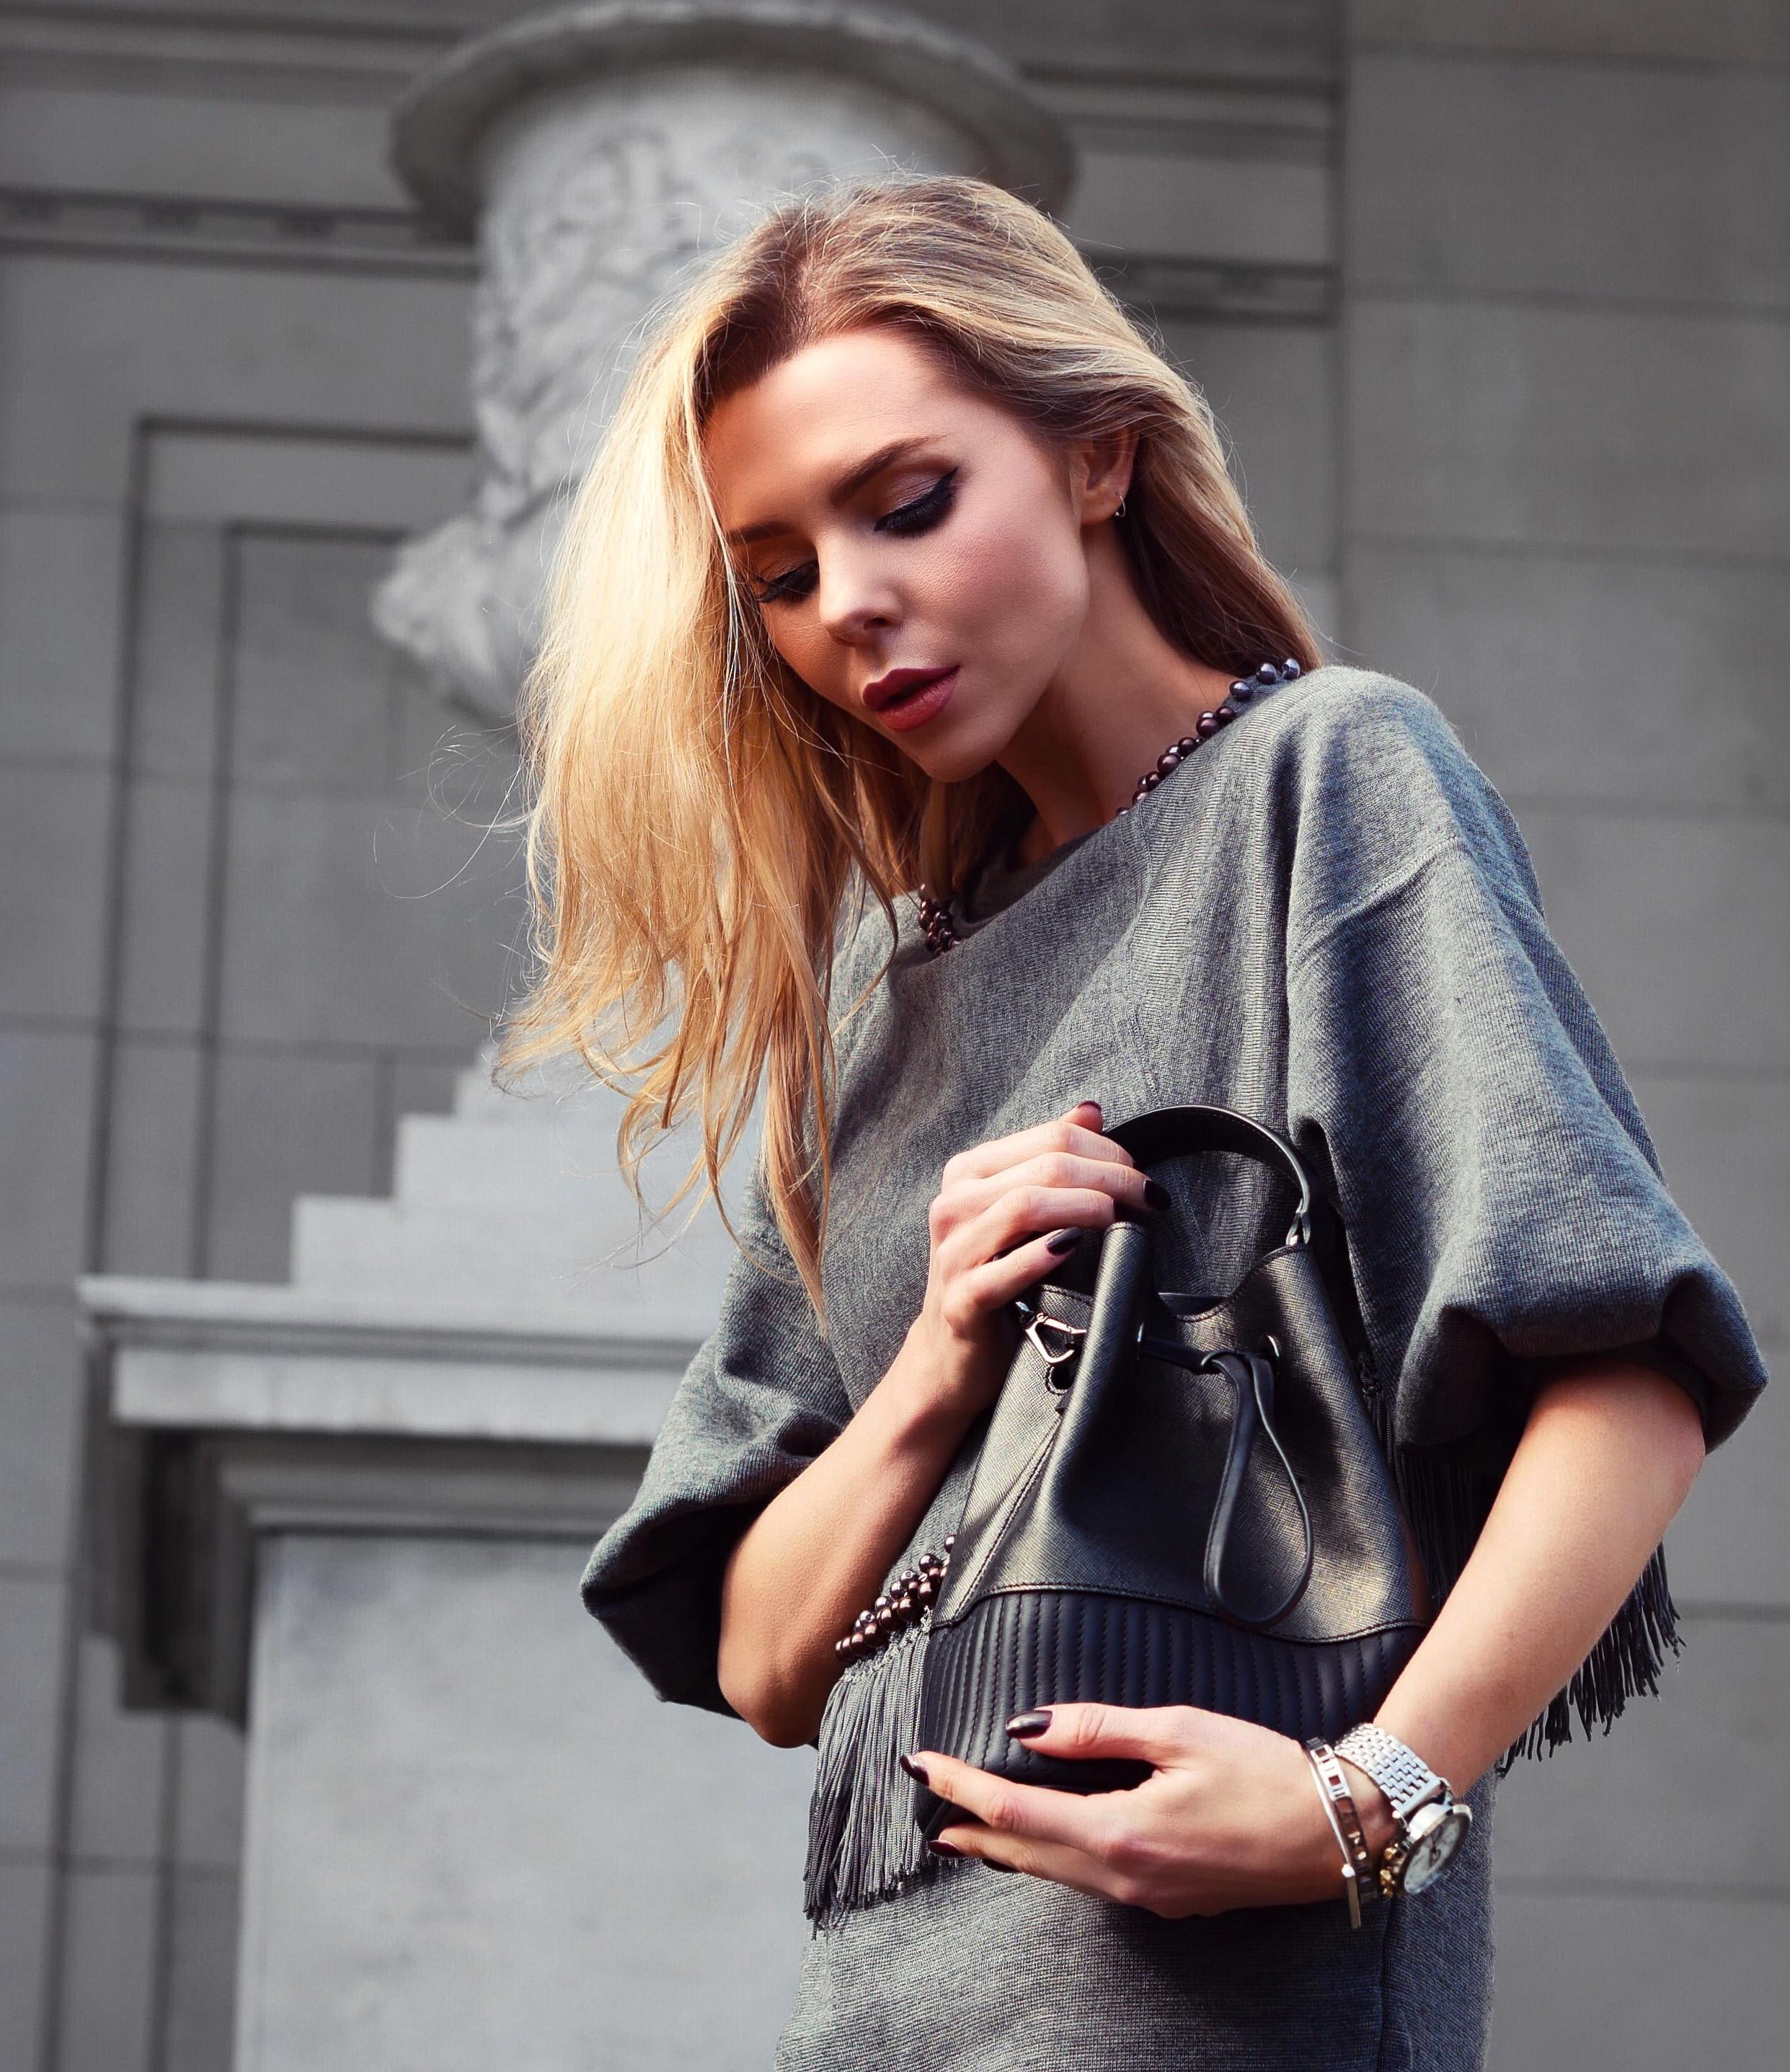 haul, fashion, streetstyle, inspiration, what to wear, fashion, lookbook, style, fashion blogger, laura blair, youtuber, london fashion girl,